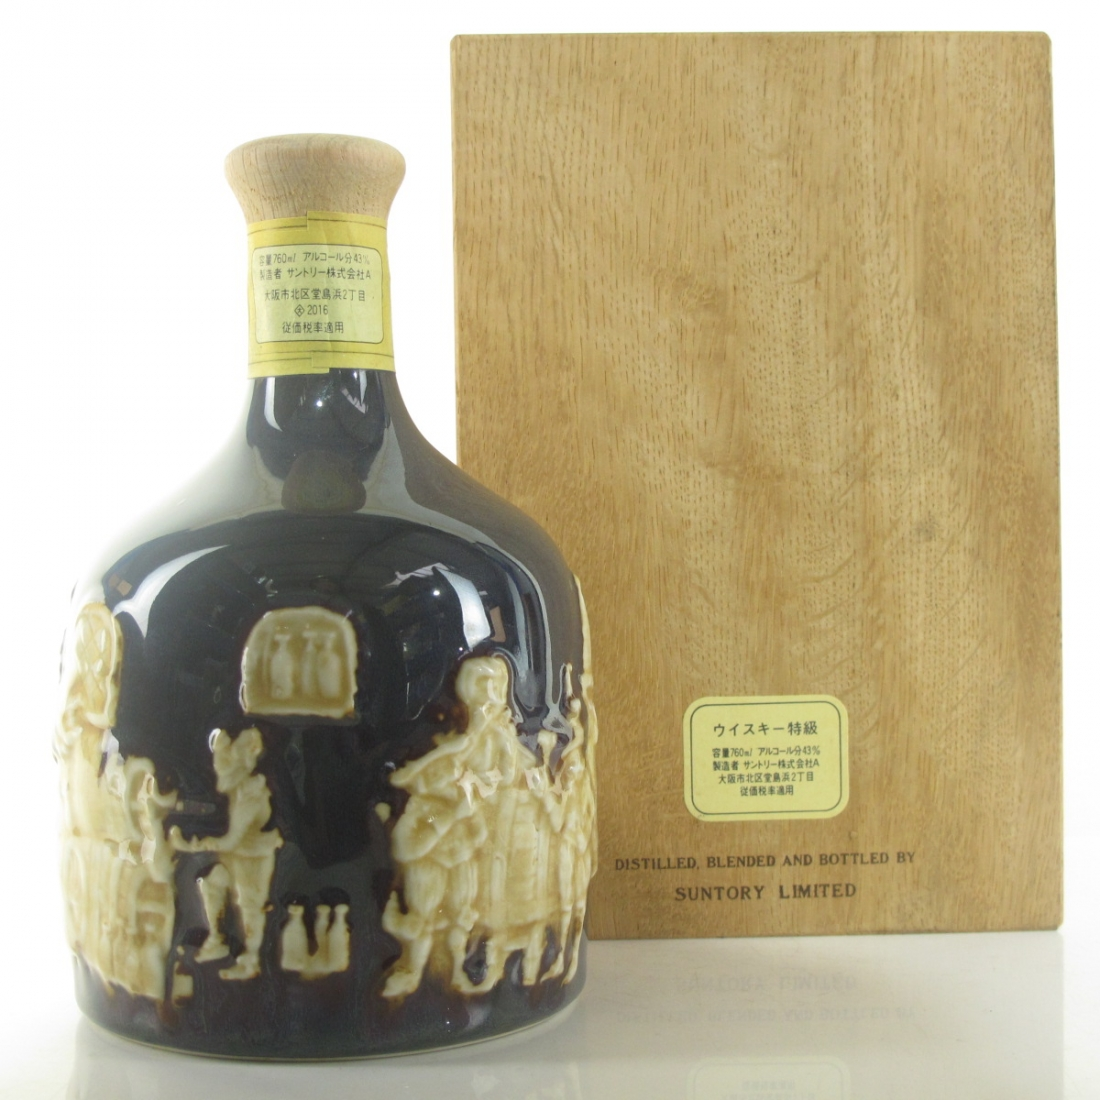 Suntory 'The Whisky' Decanter